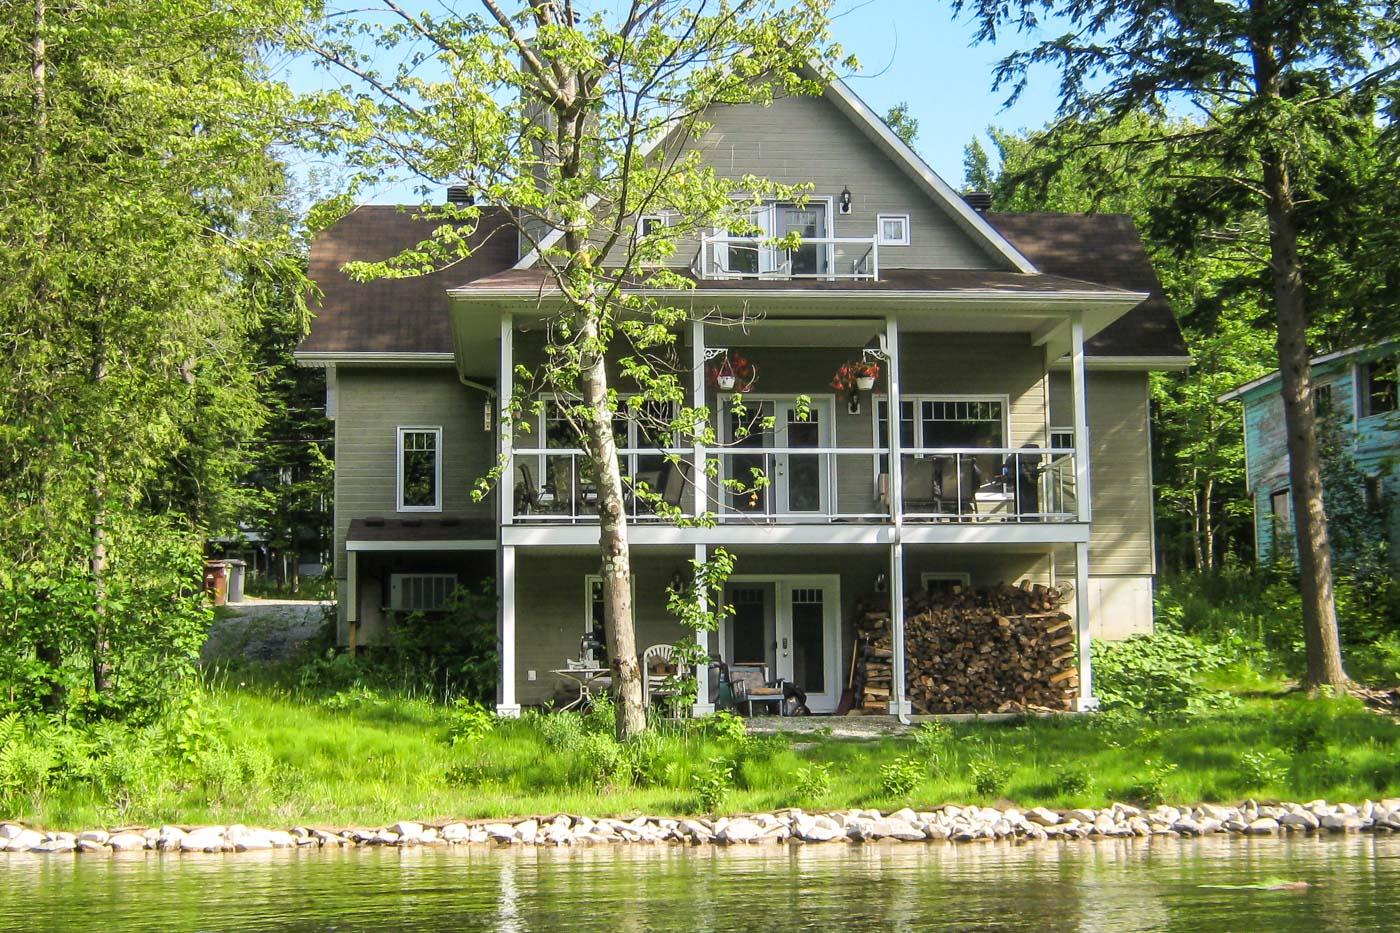 Maison bureau sherbrooke rue ravel rock forest saint Élie